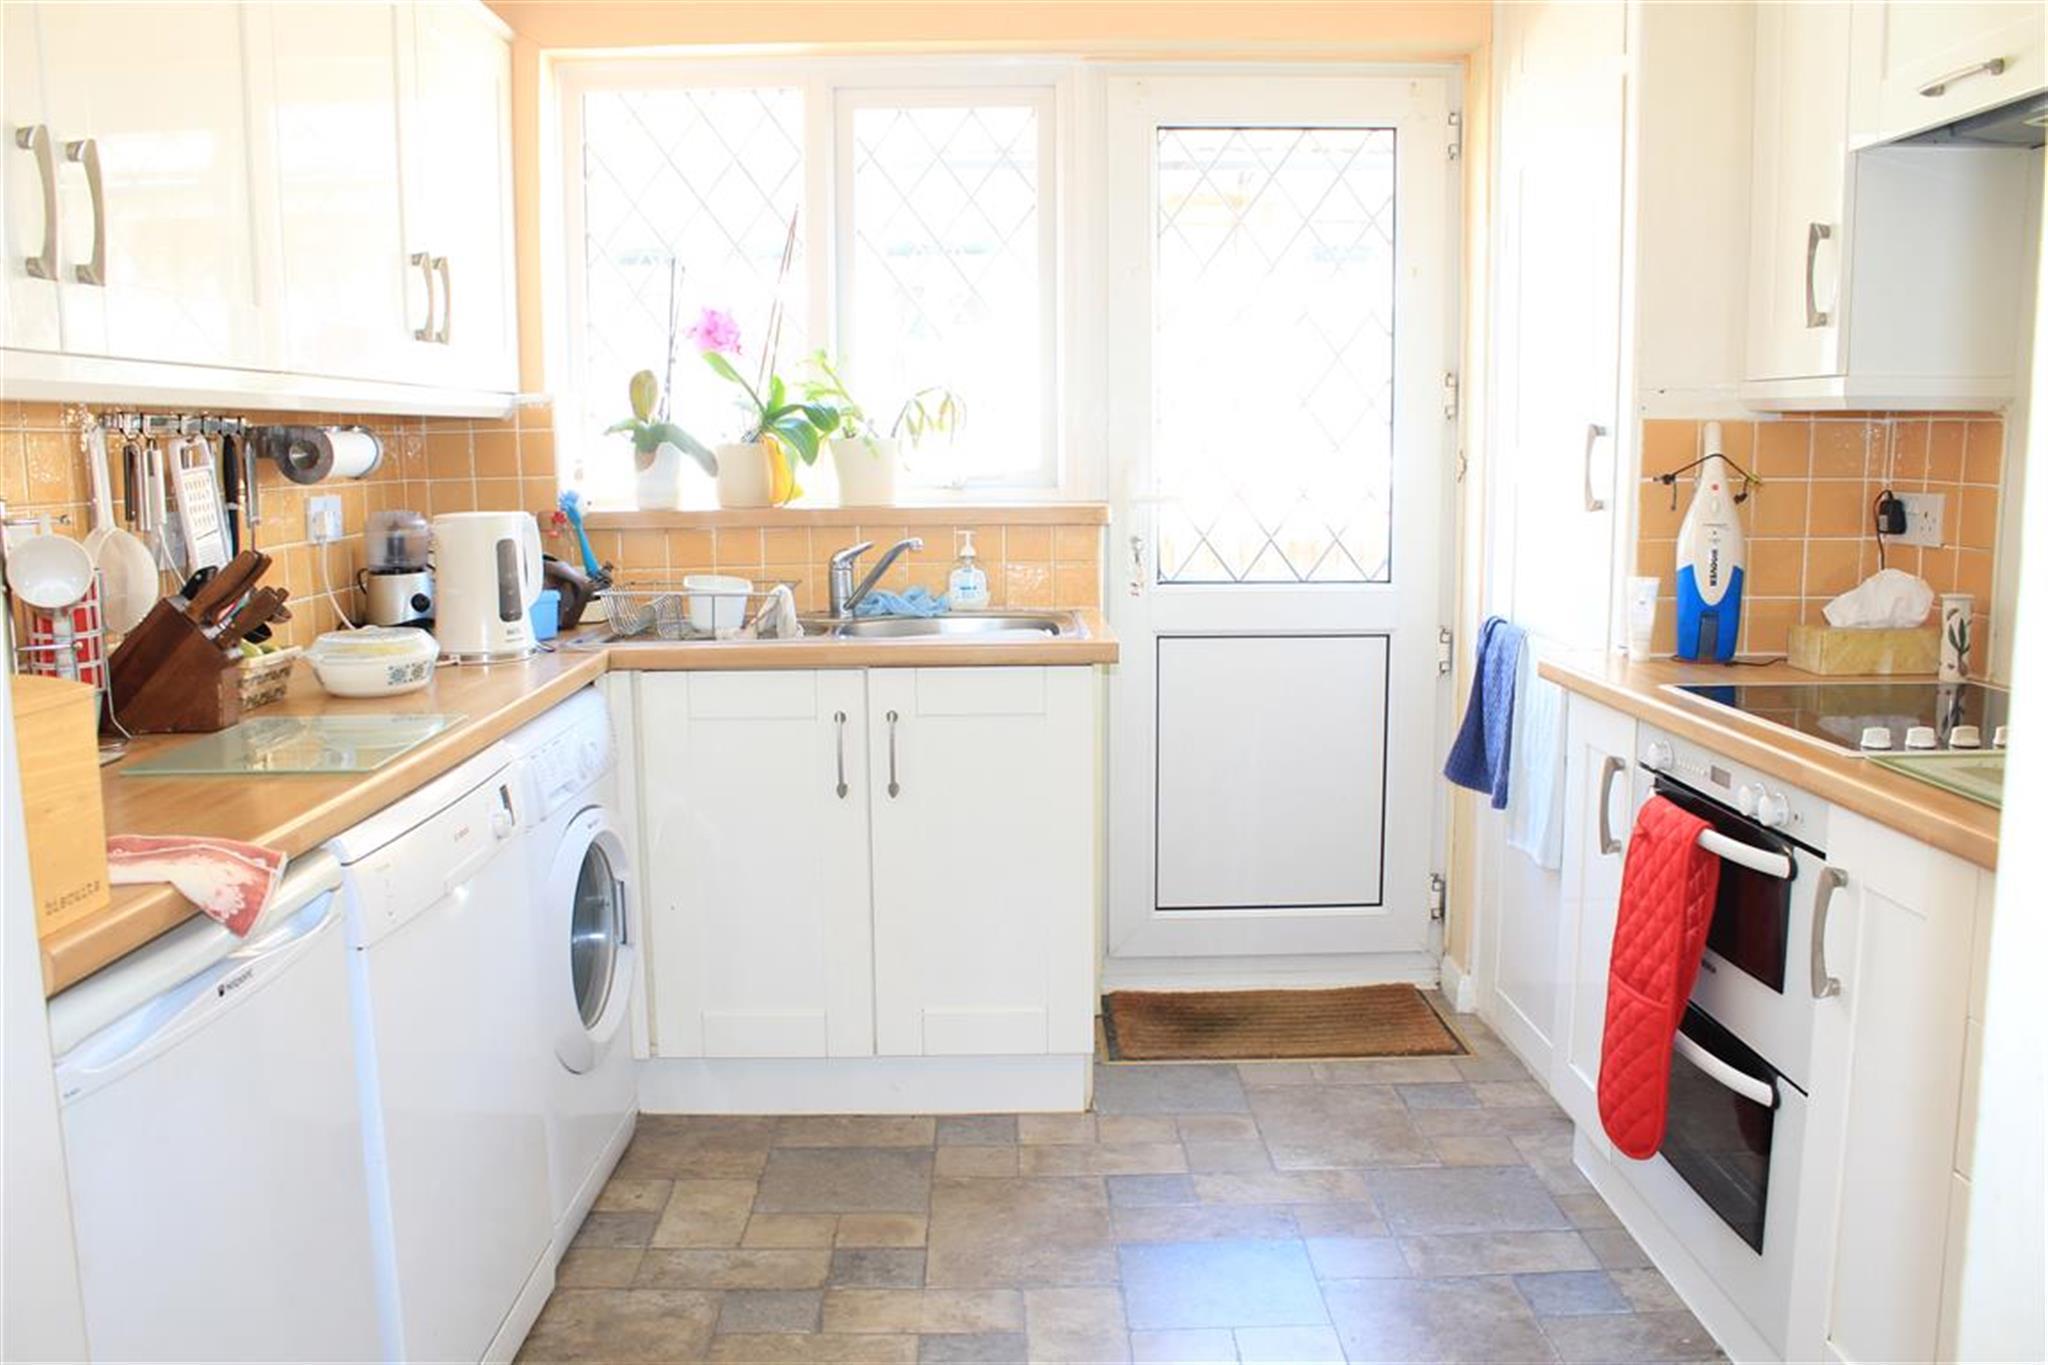 3 bedroom detached bungalow for sale Val